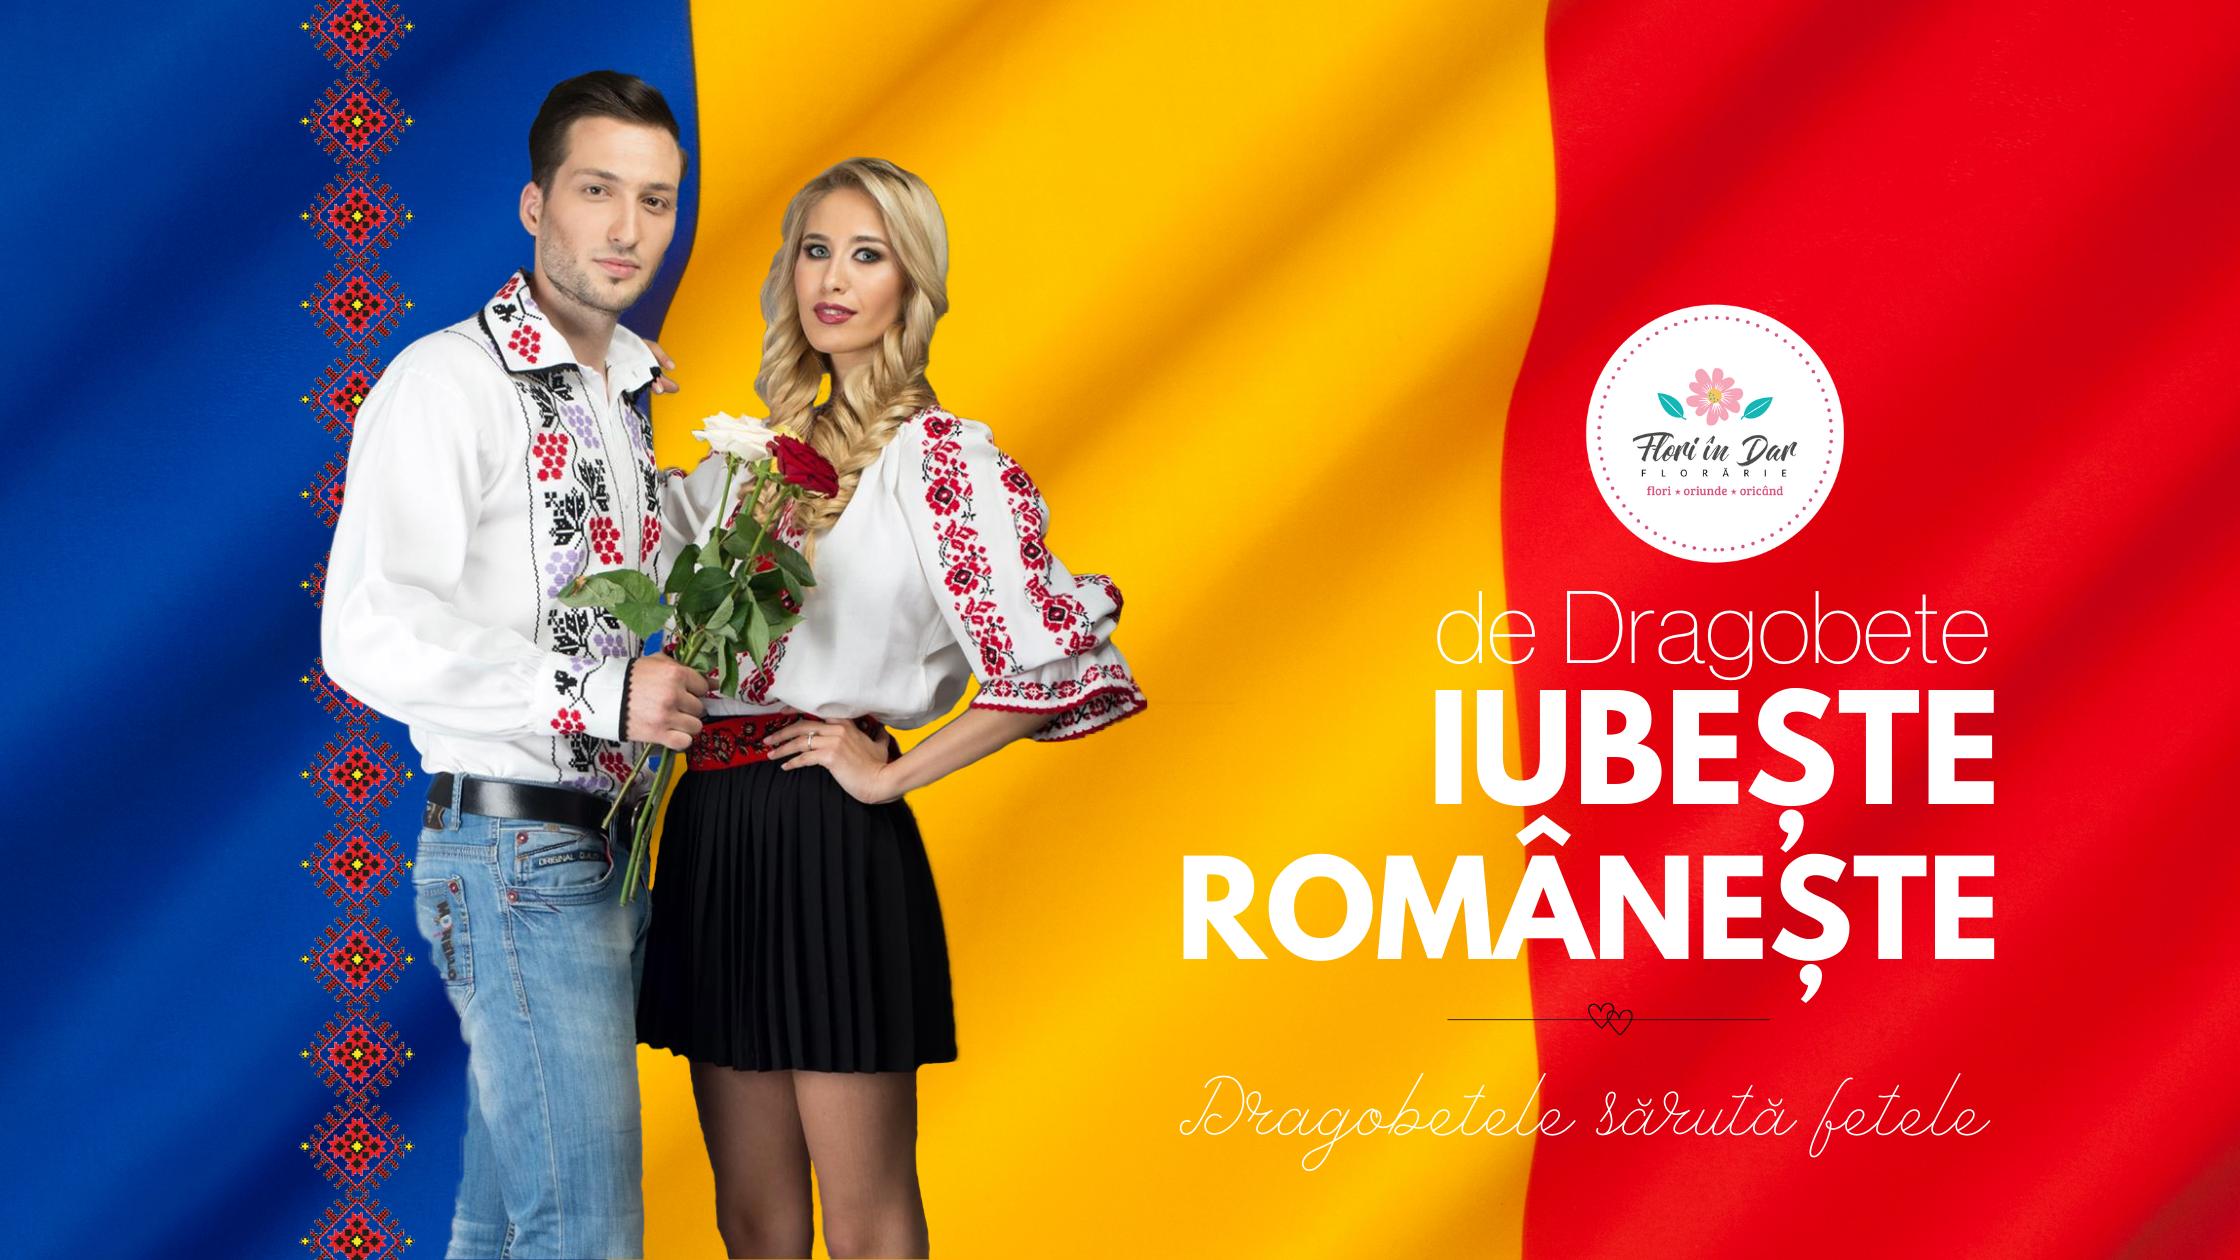 Trimite flori de Dragobete - Flori in Dar florarie online Roman